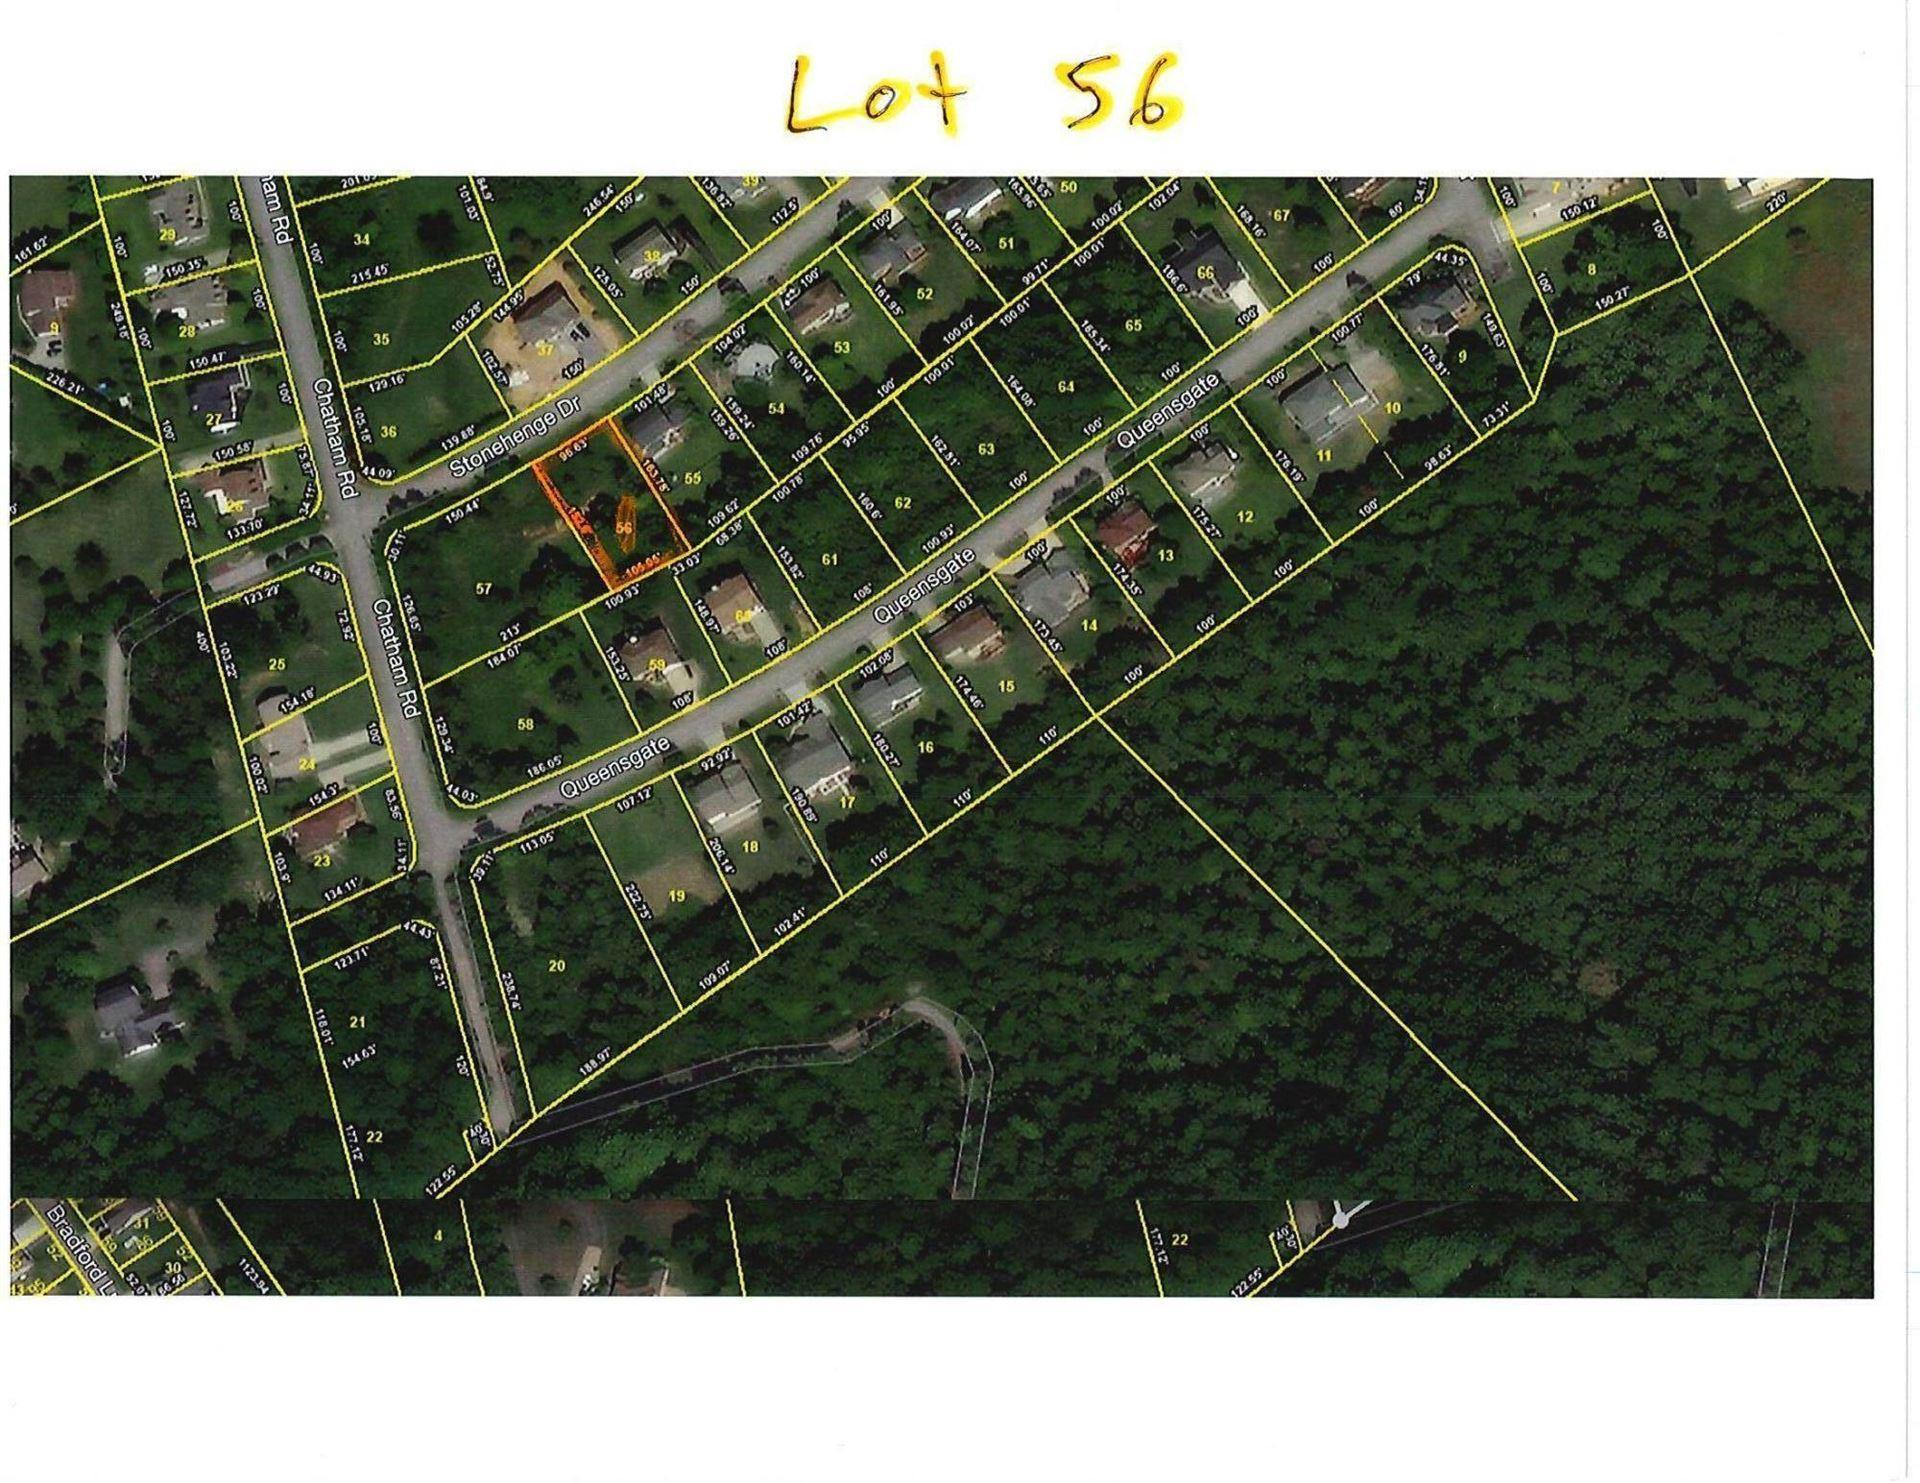 Photo of Lot 56 Stonehenge Drive, Bristol, TN 37620 (MLS # 9930039)